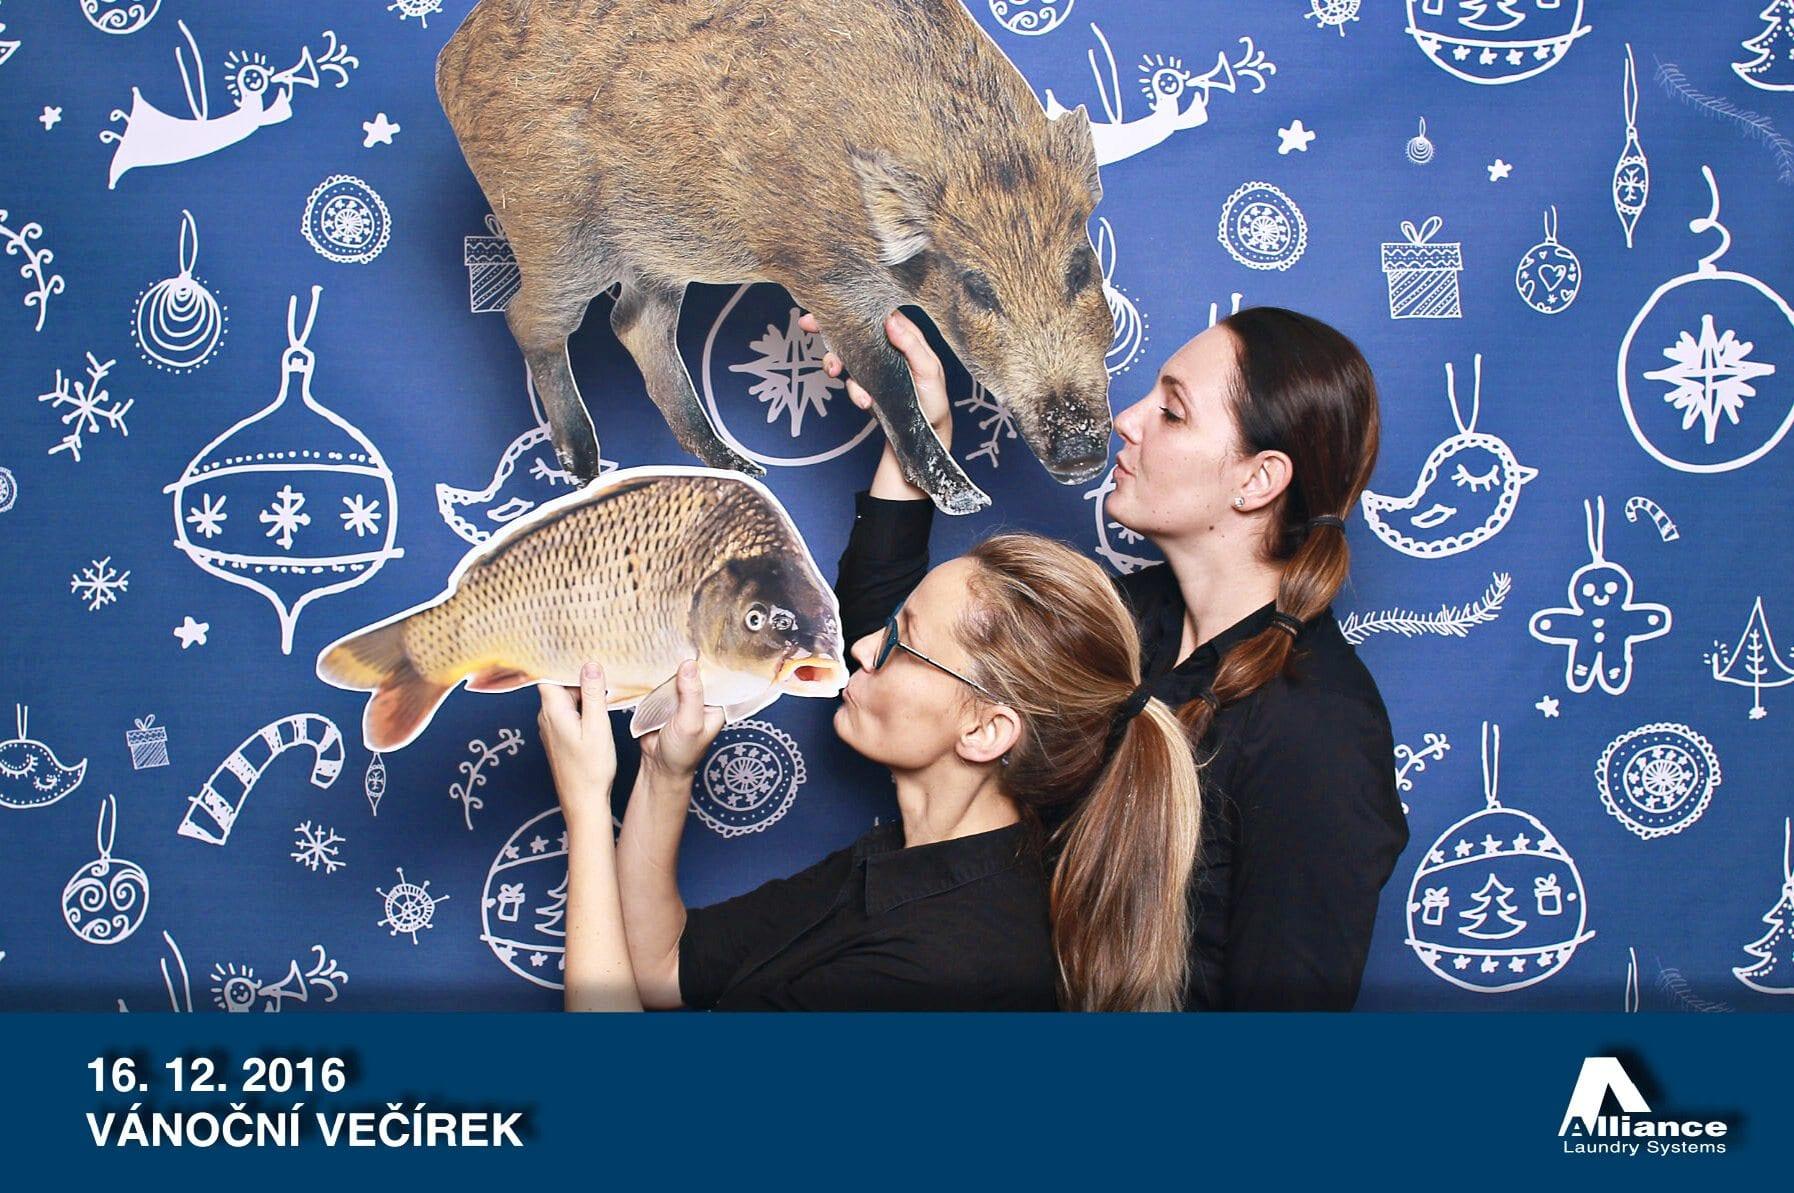 fotokoutek-alliance-loundry-systems-vanocni-vecirek-16-12-2016-192105